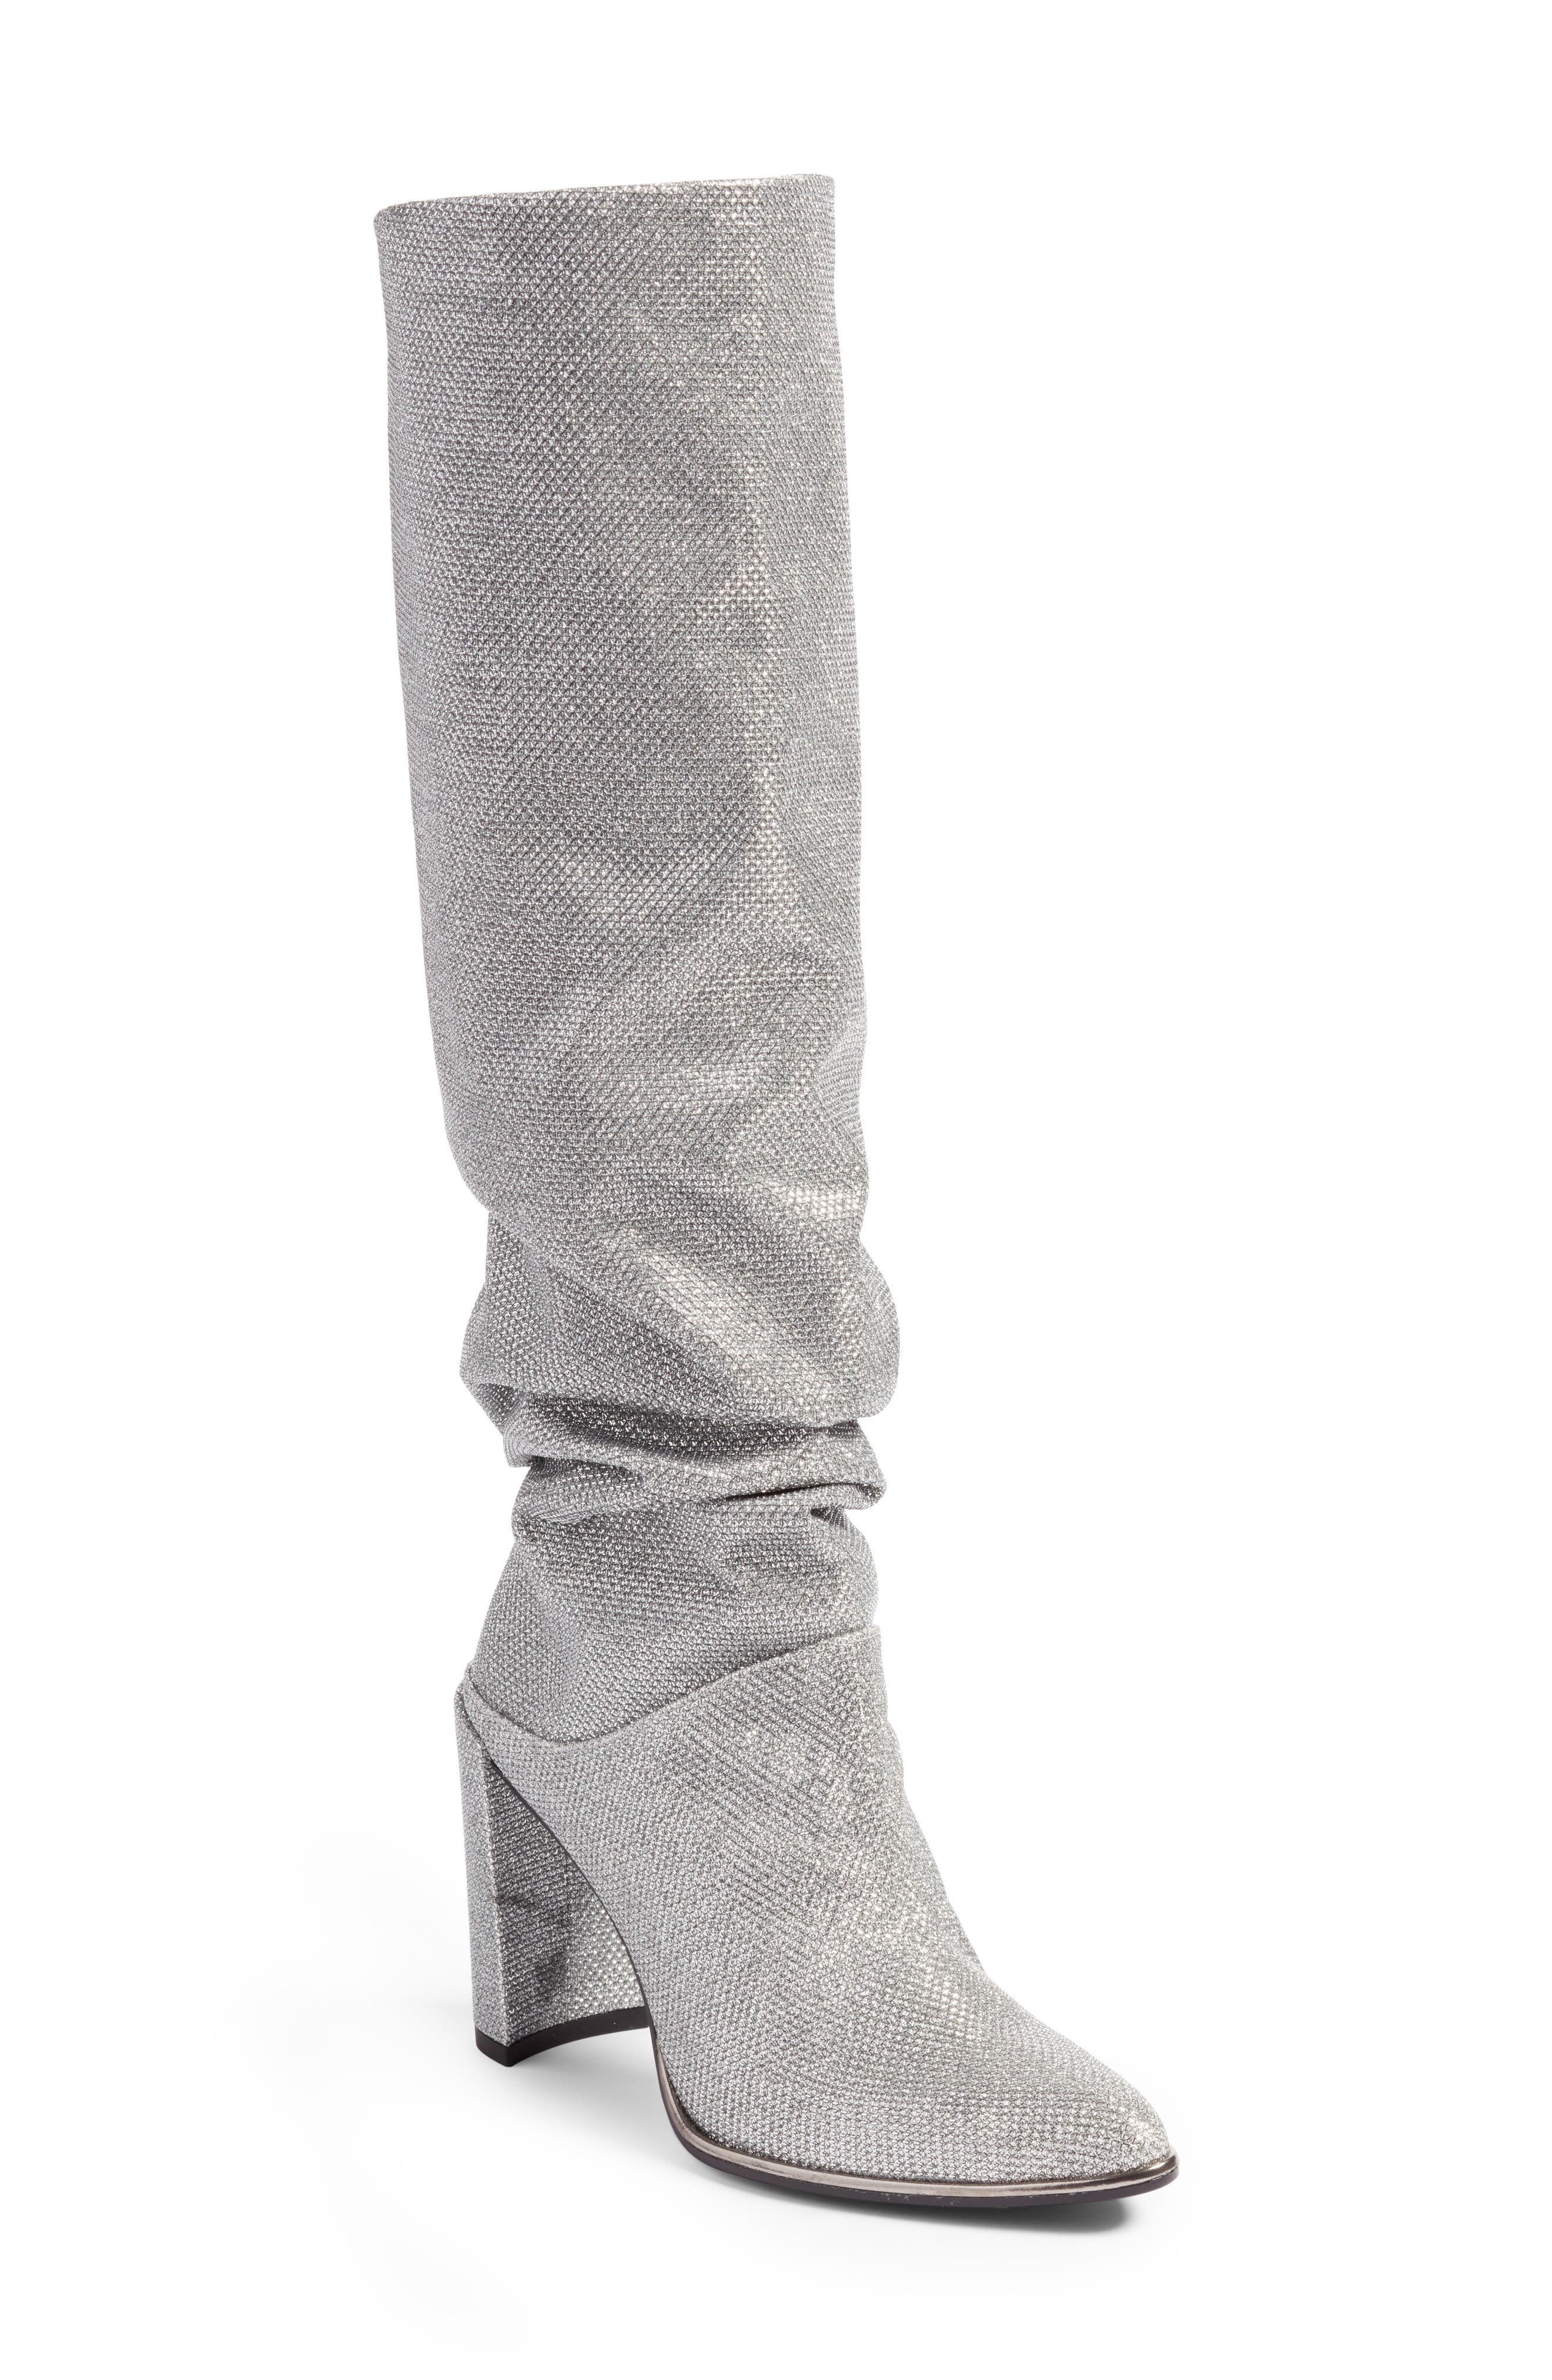 Alternate Image 1 Selected - Stuart Weitzman Smashing Knee High Boot (Women)